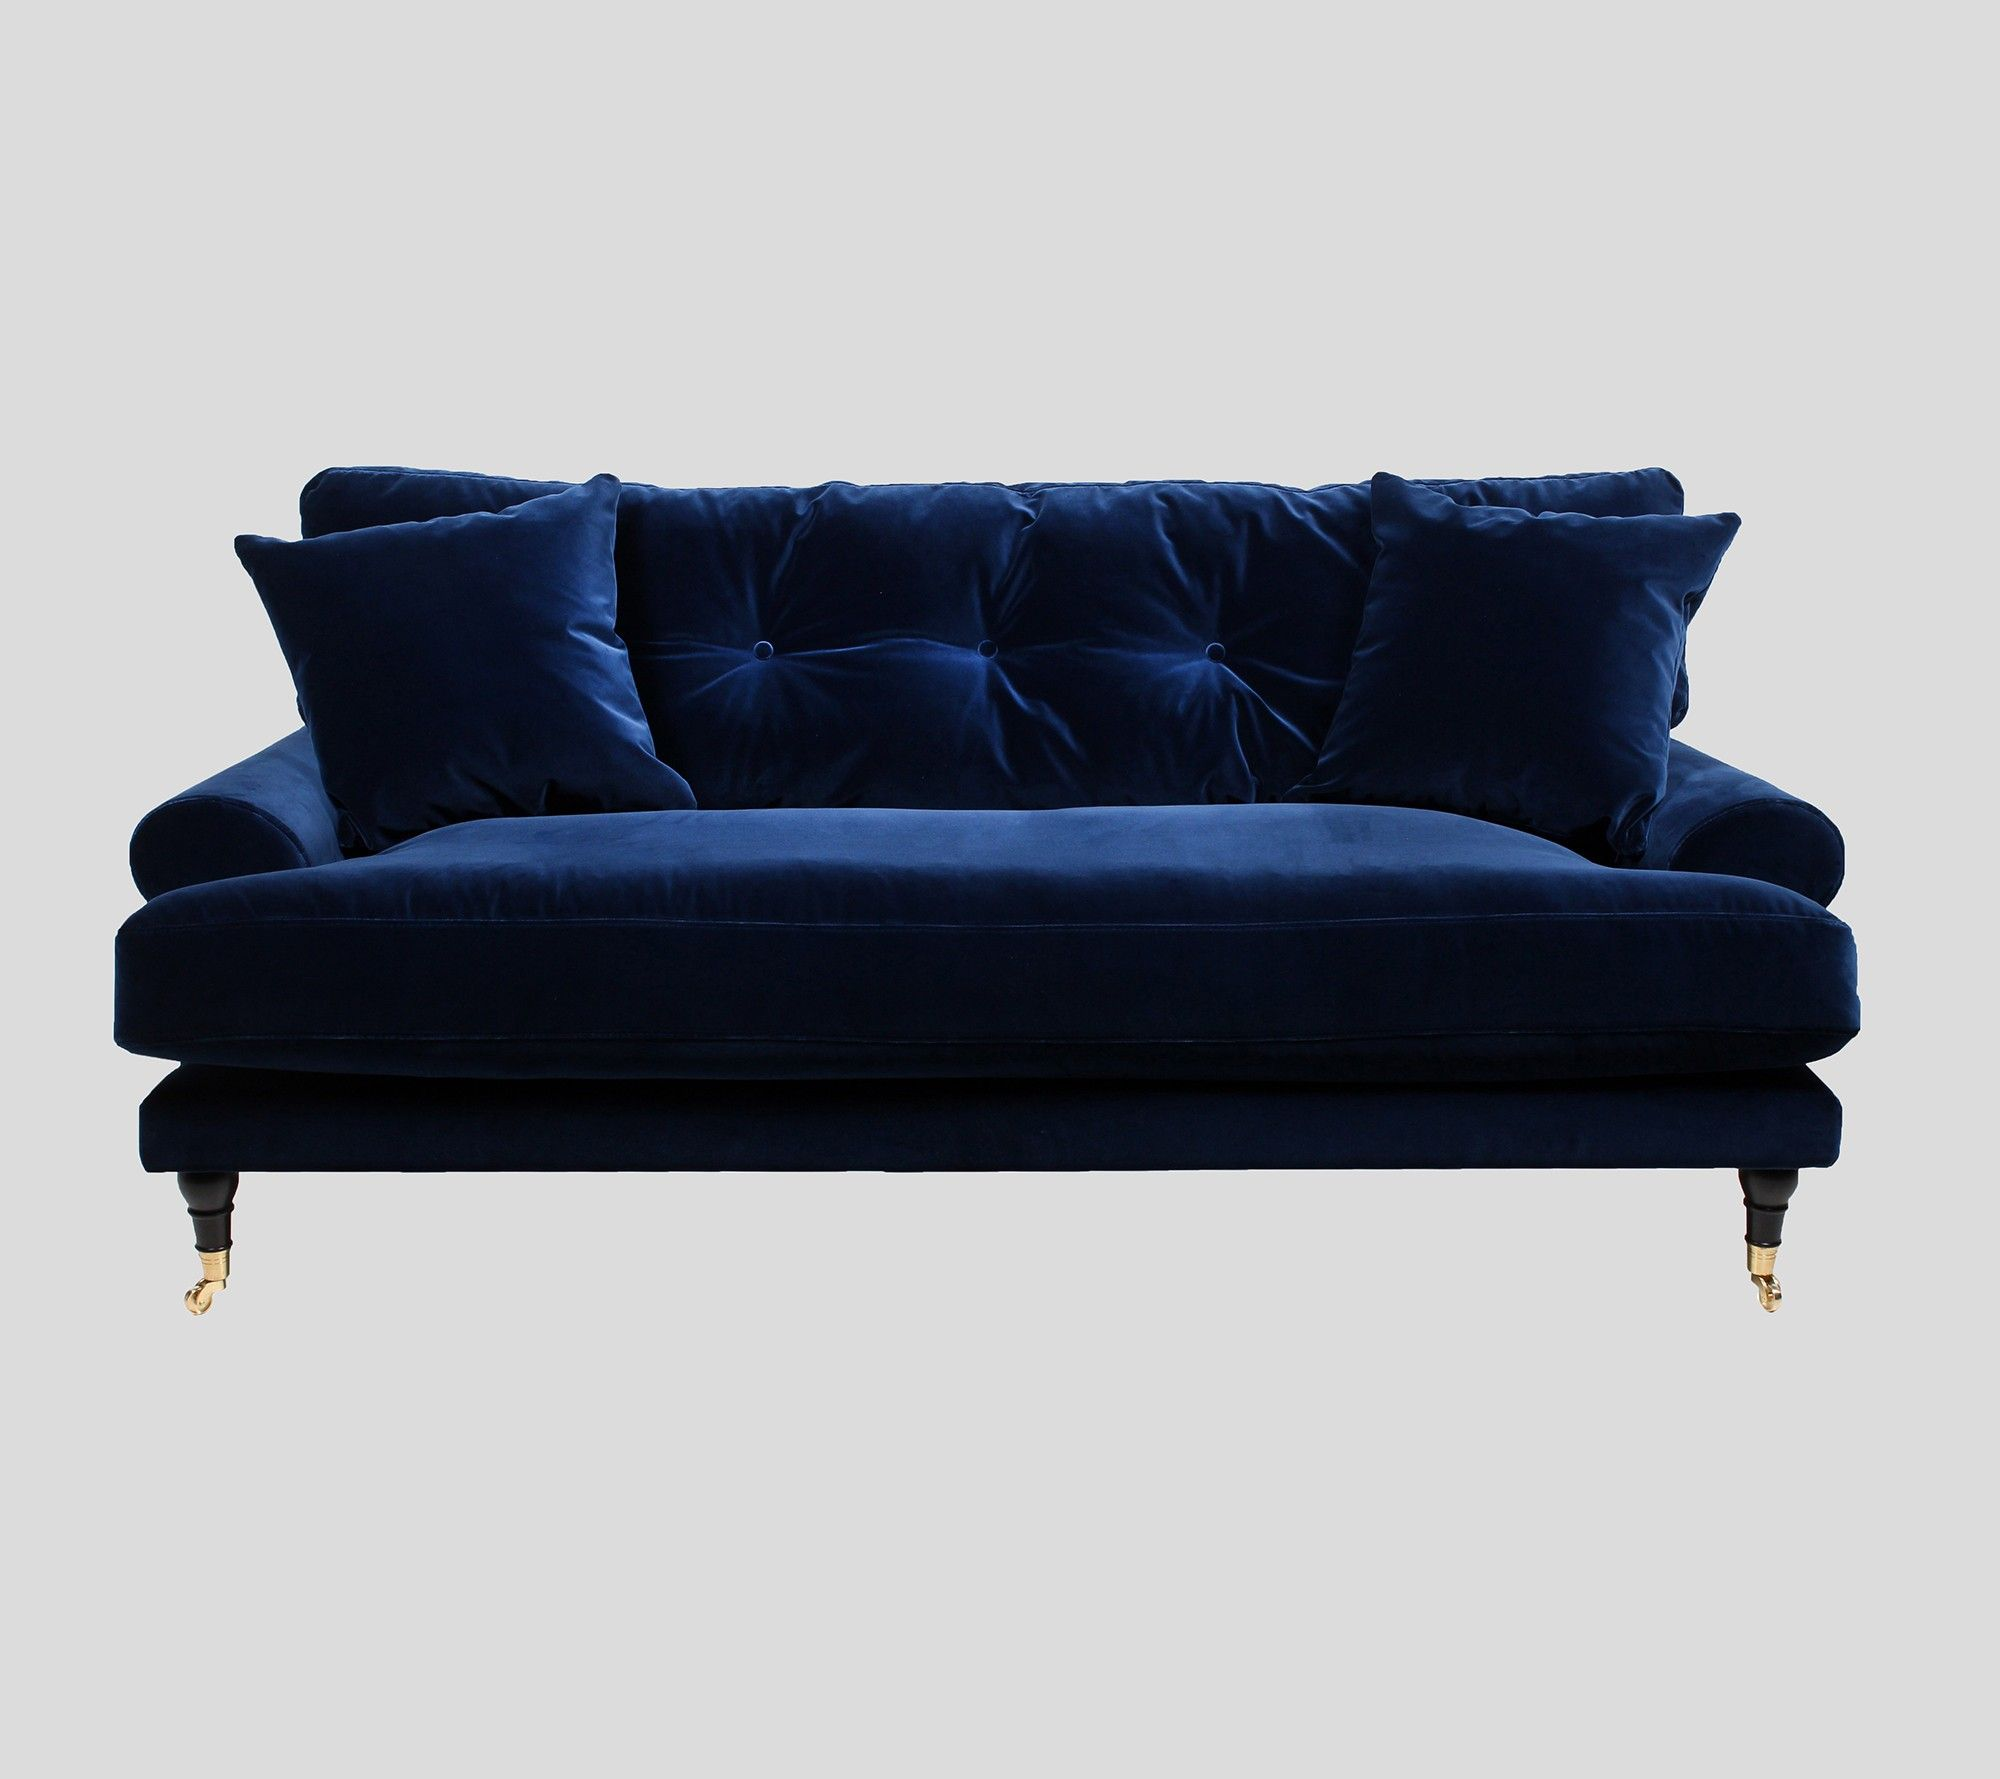 Green Velvet Sofa Couch Tri Fold Sleeper Deep Blue In Two & Three Seat | Sofas Att ...